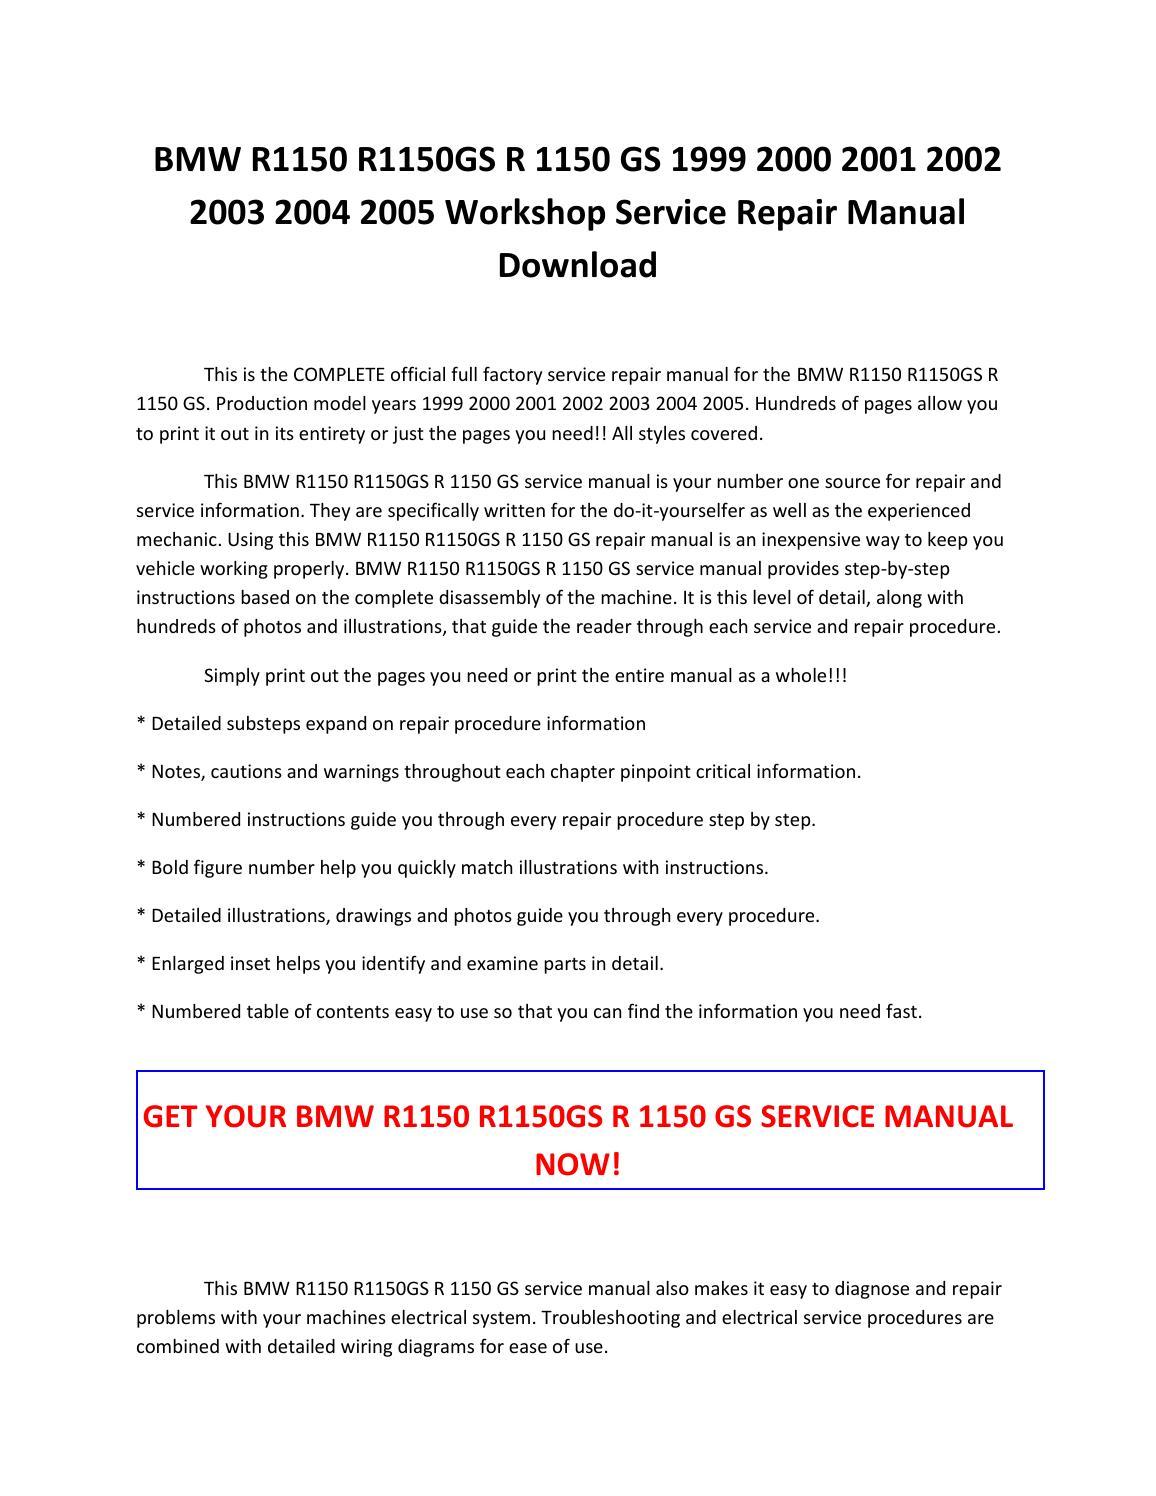 Bmw r1150 r1150gs r 1150 gs 1999 2000 2001 2002 2003 2004 2005 service  repair manual pdf download by sparchita3 - issuu